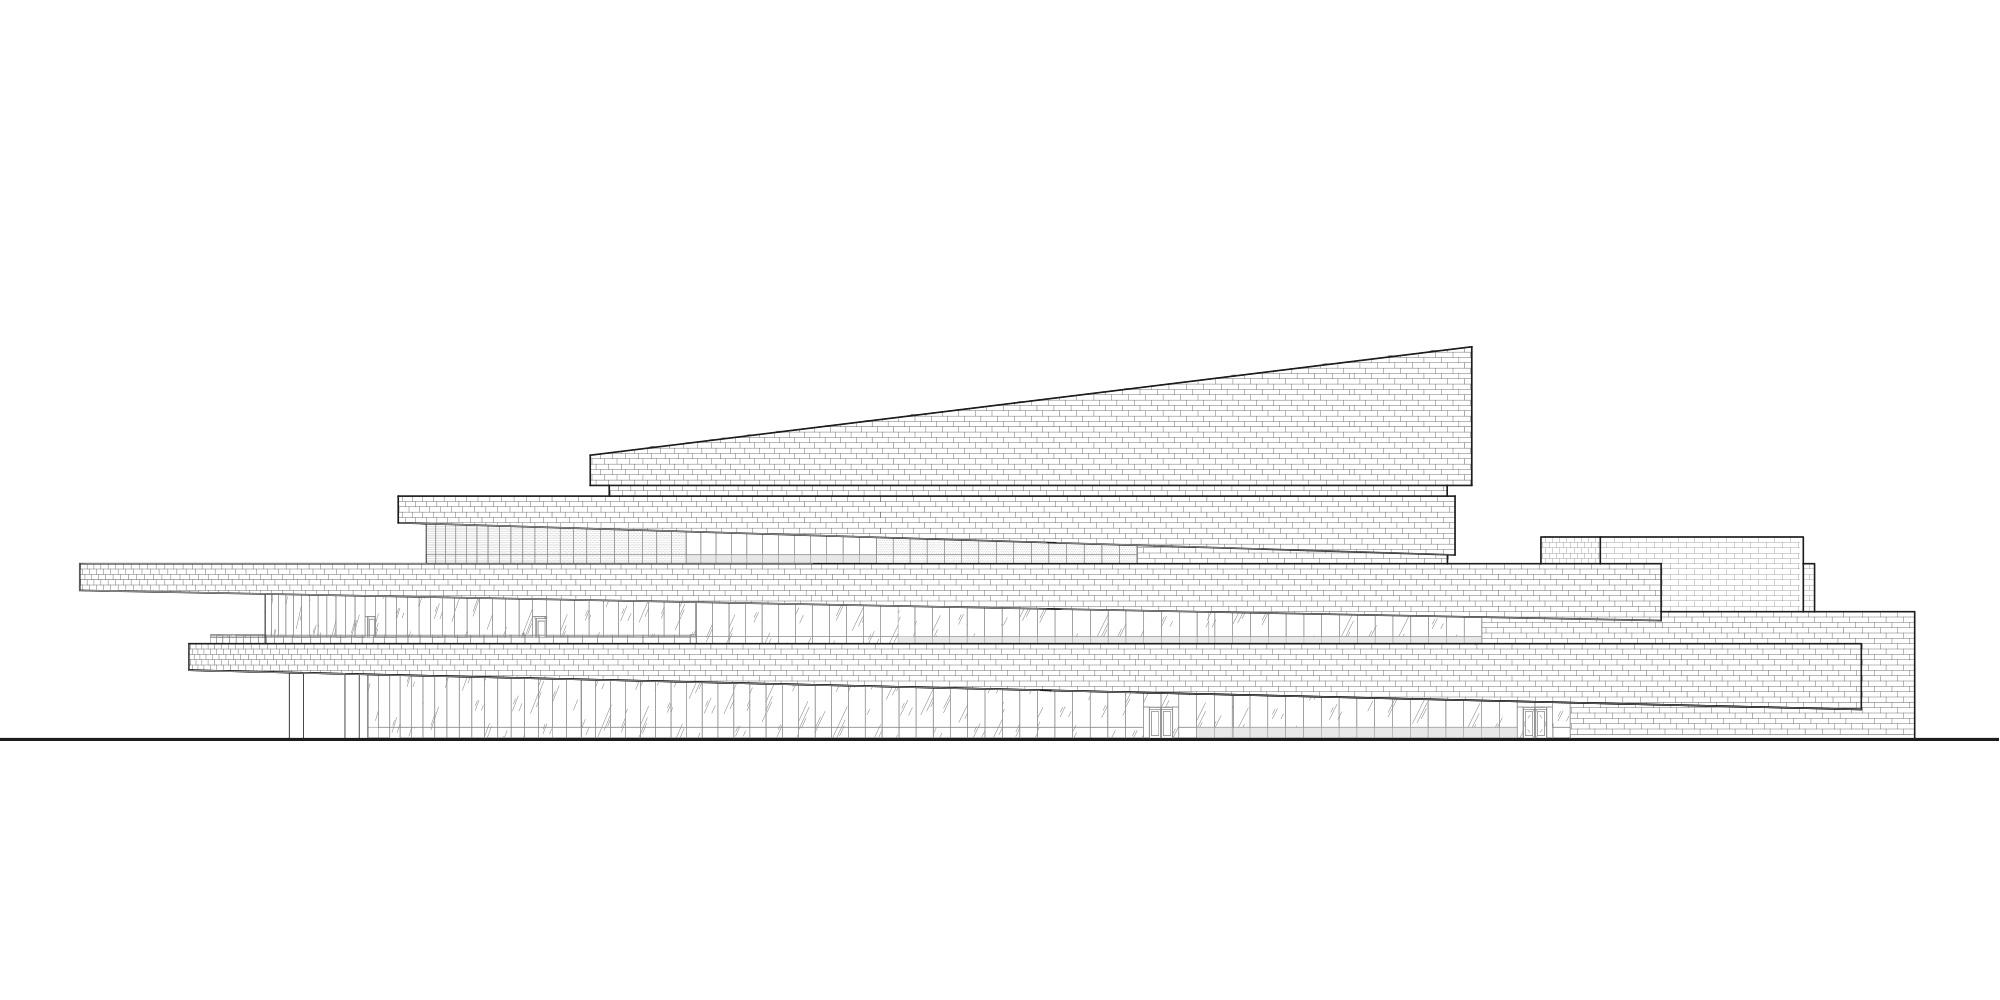 East Elevation © Pelli Clarke Pelli Architects